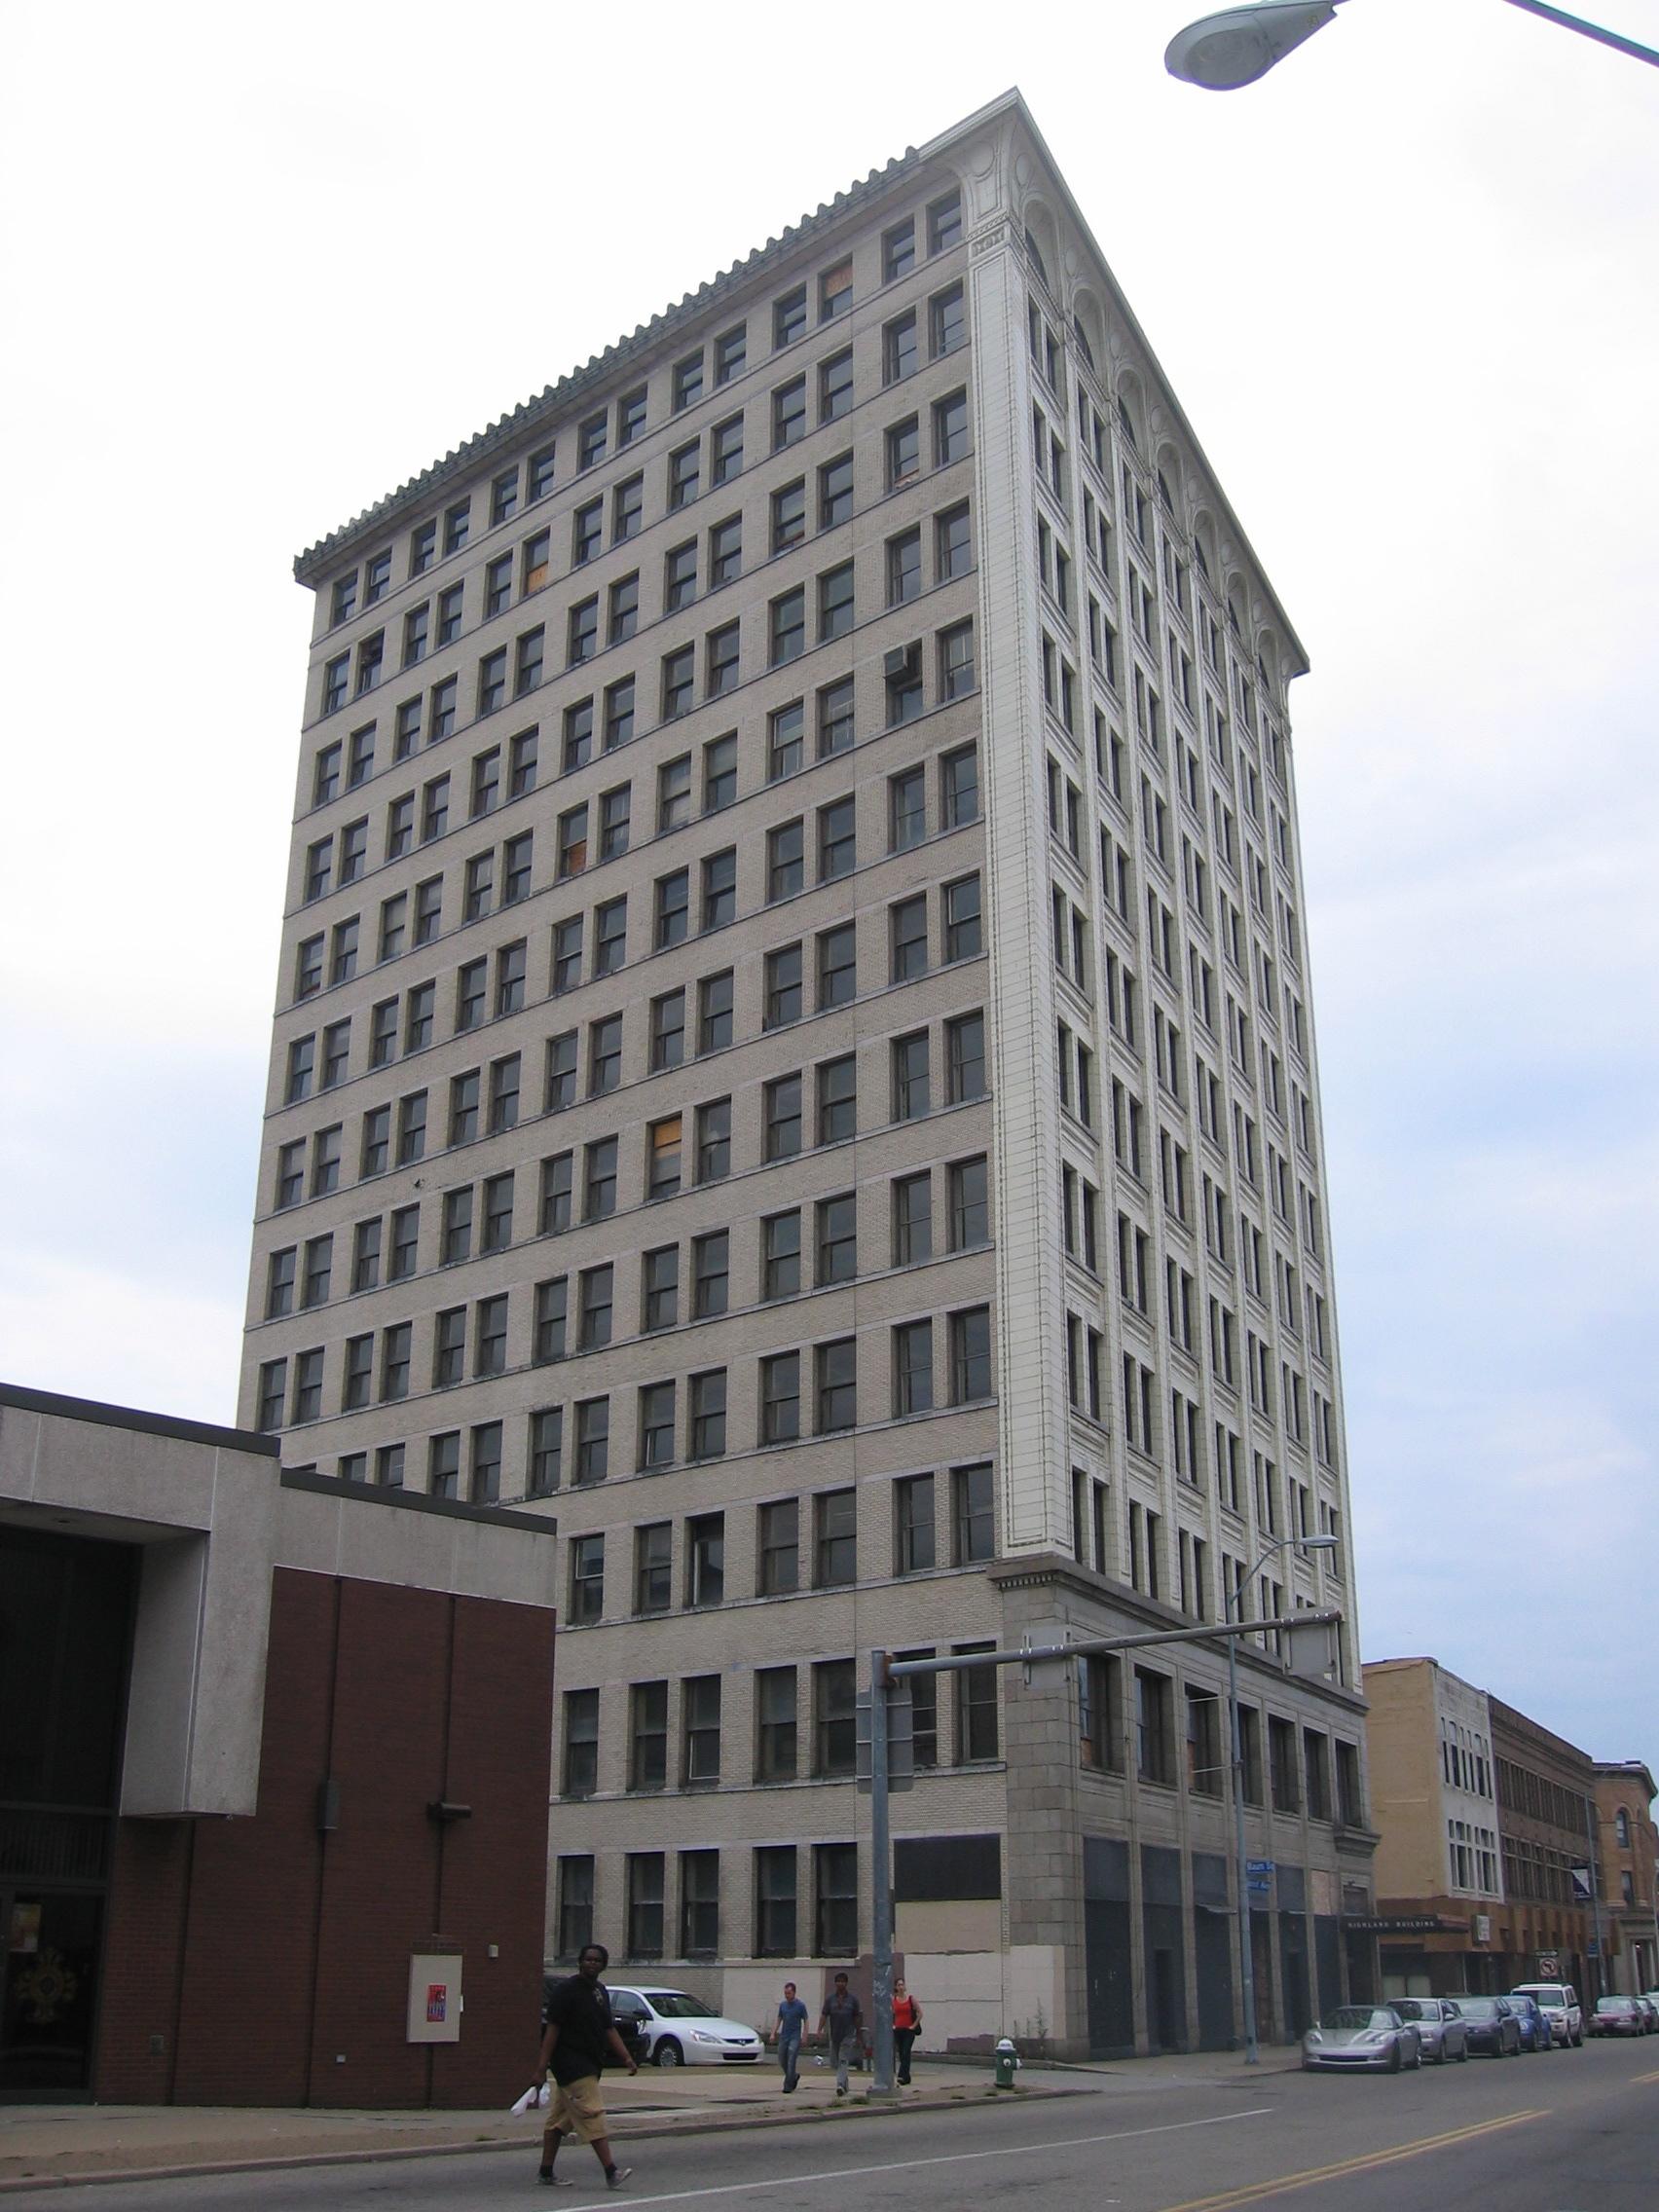 Highland Building - Wikipedia